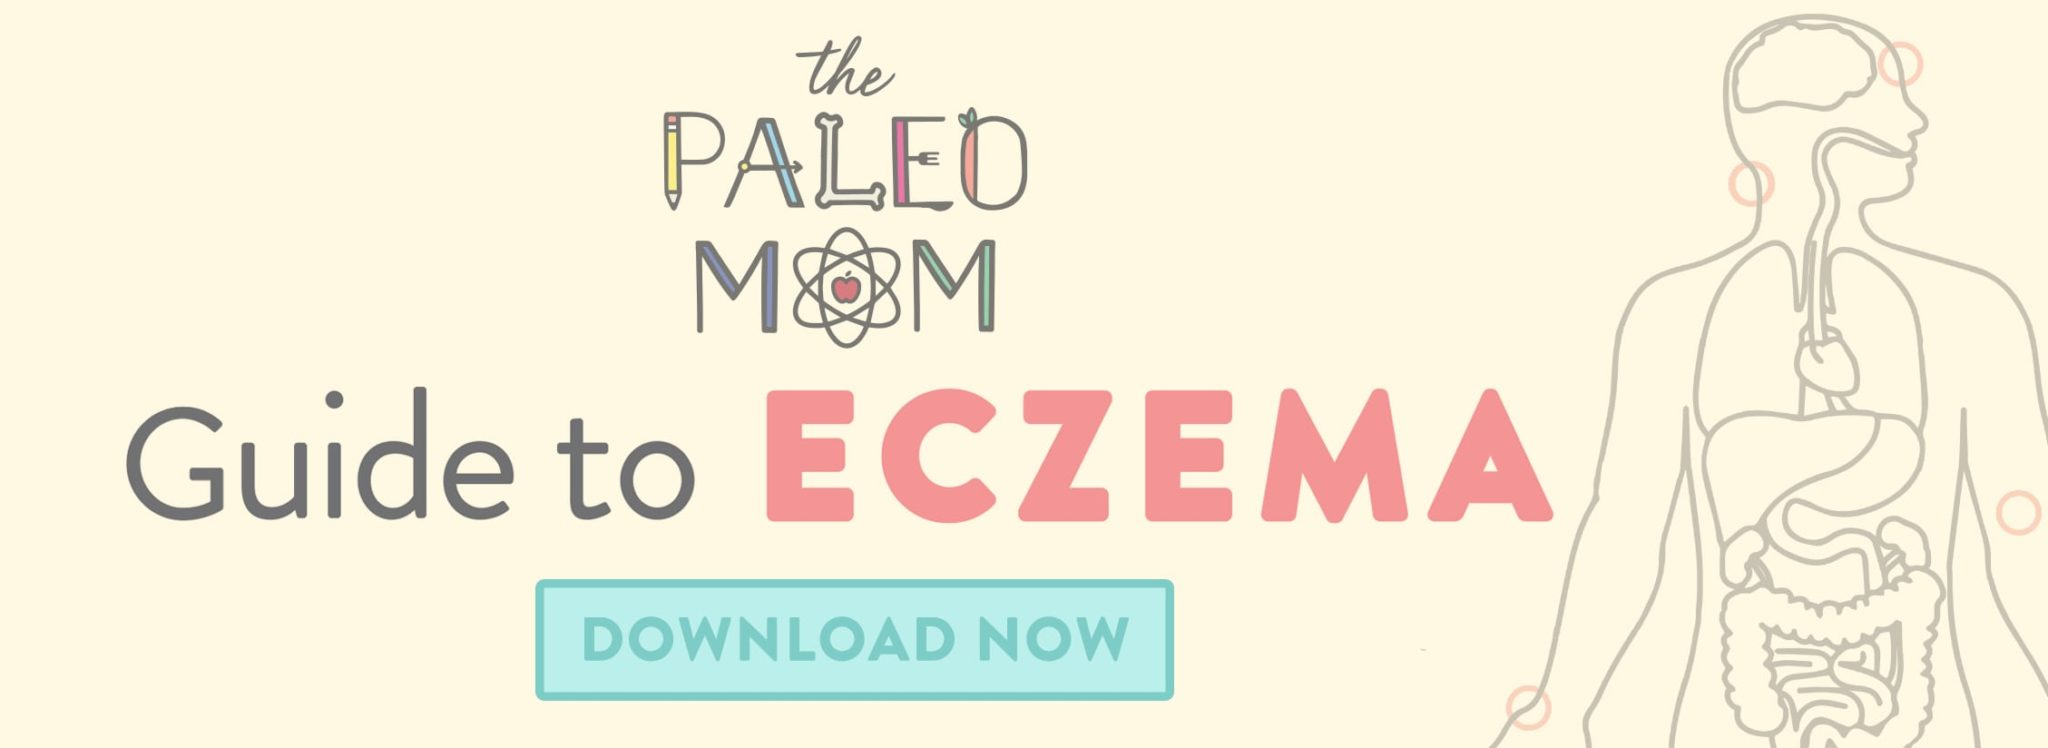 guide to eczema